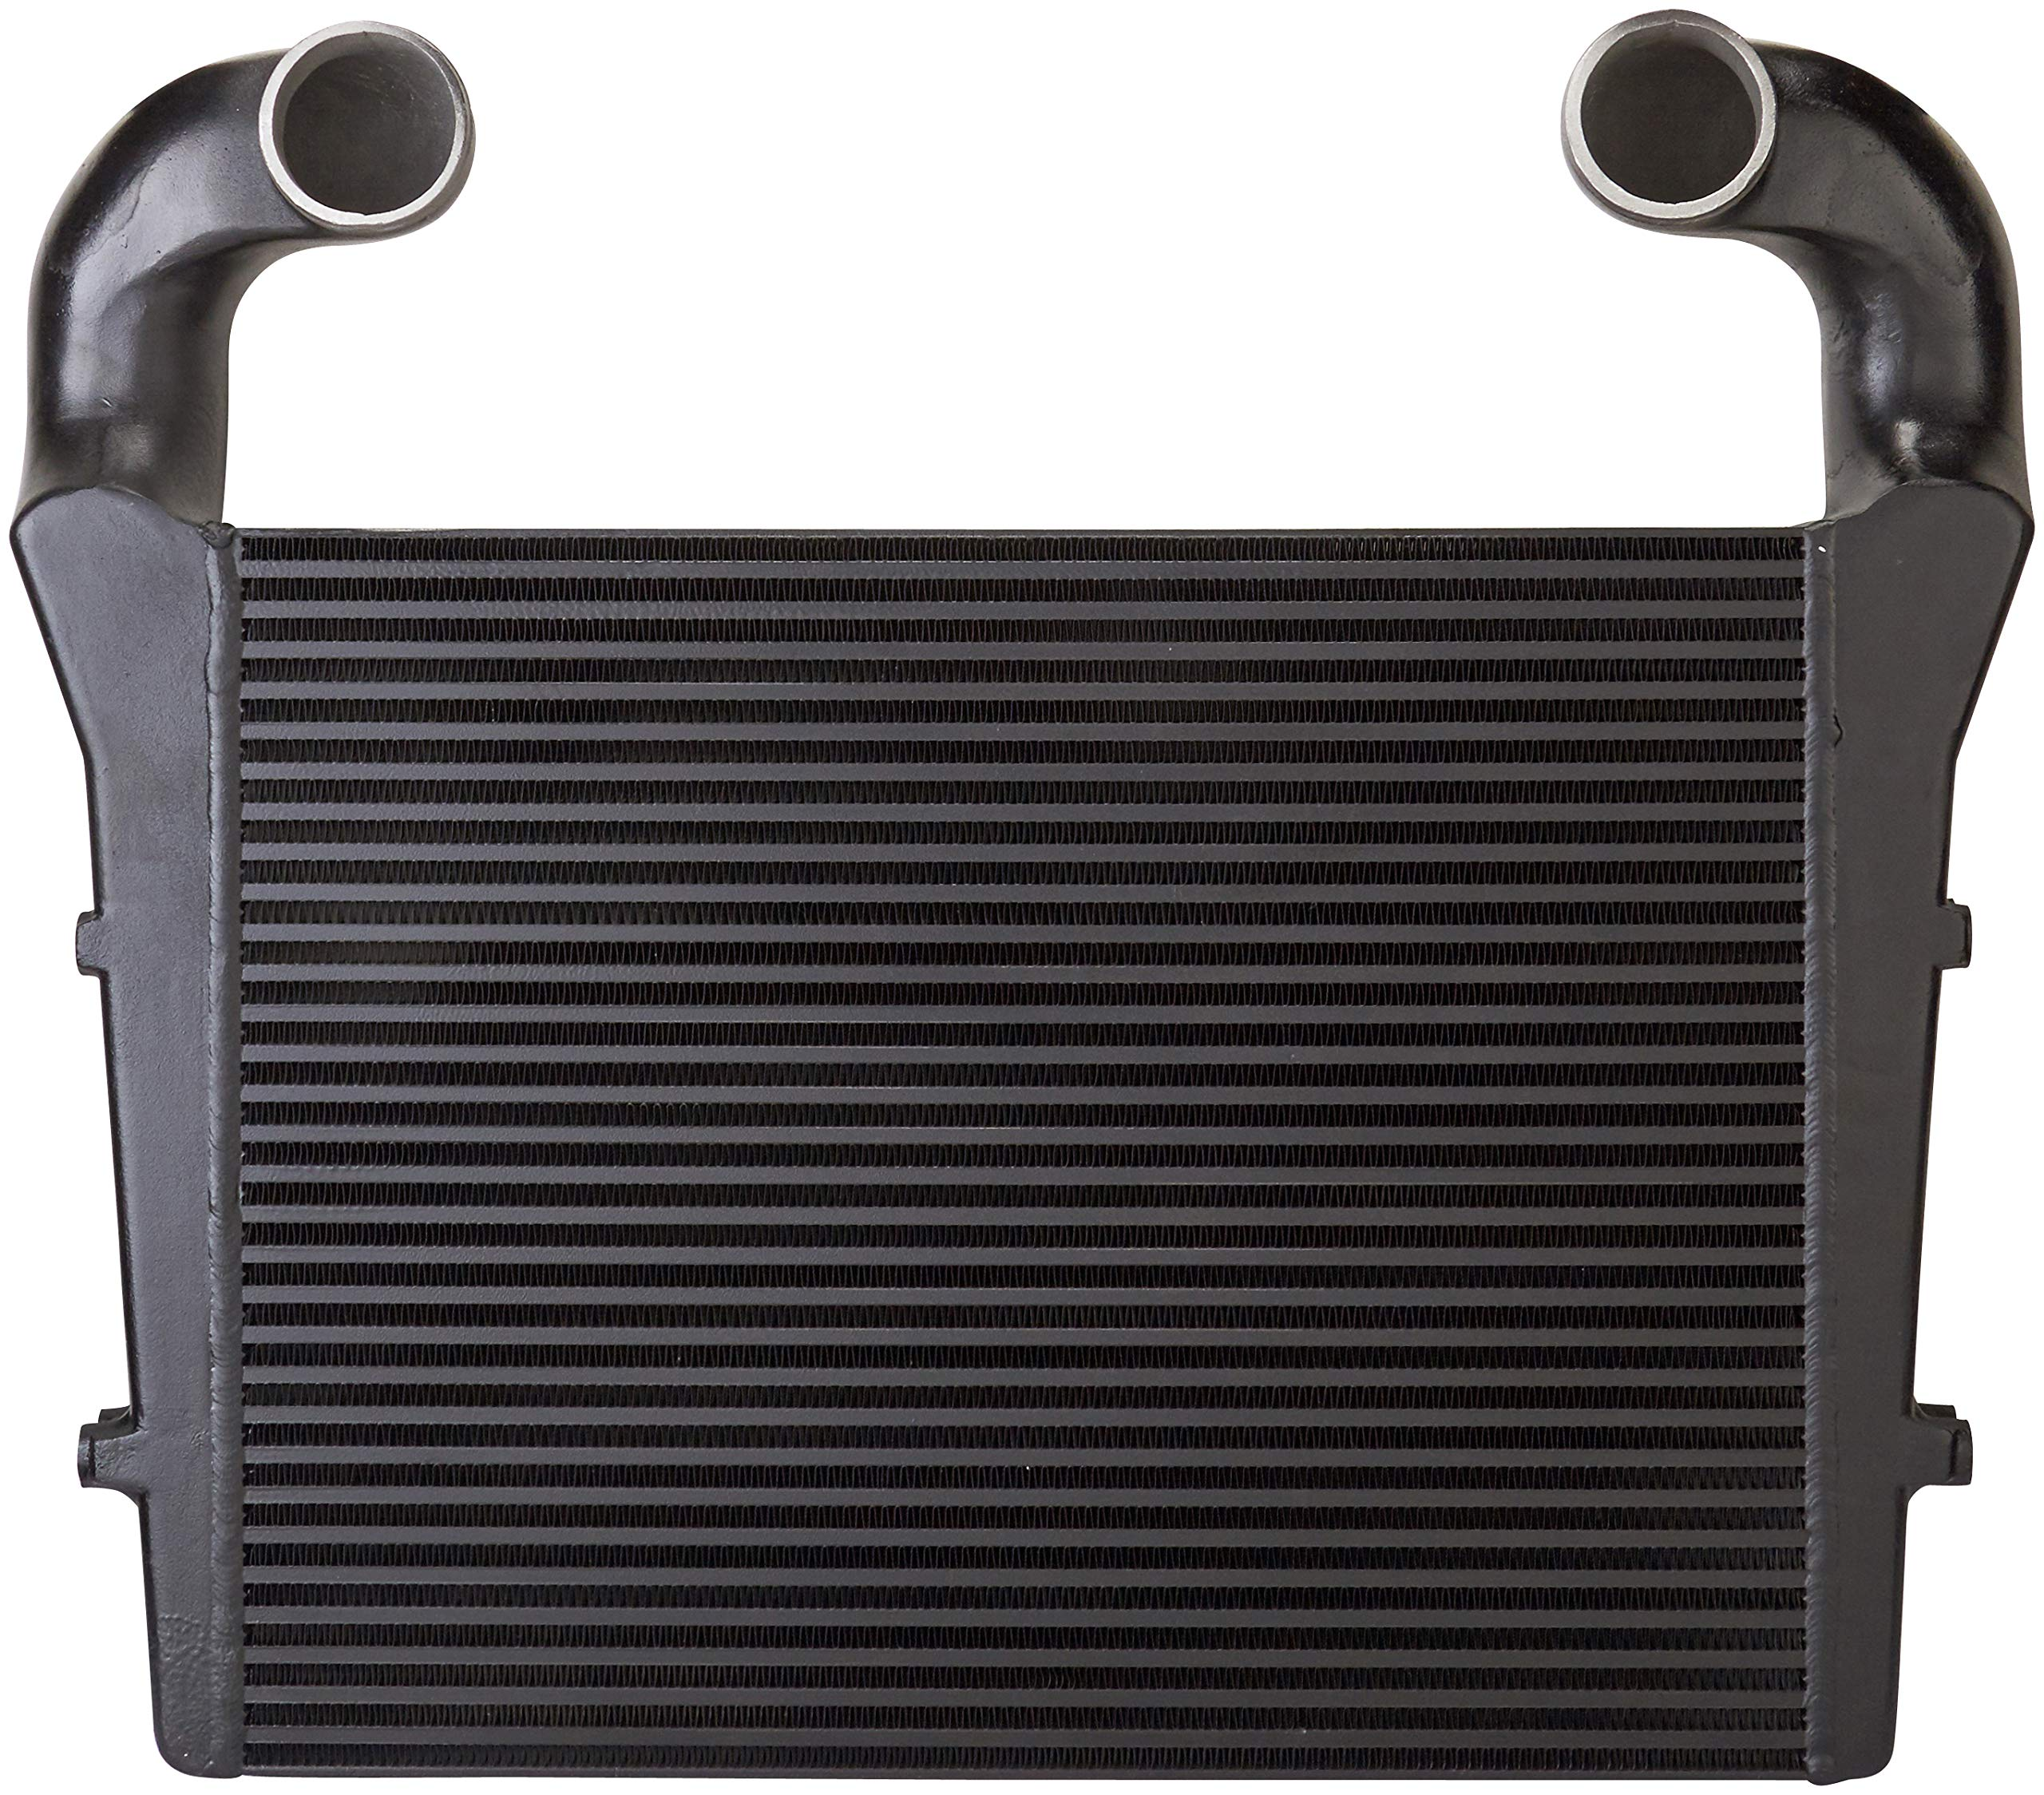 Spectra Premium 4401-4801 Turbocharger Intercooler by Spectra Premium